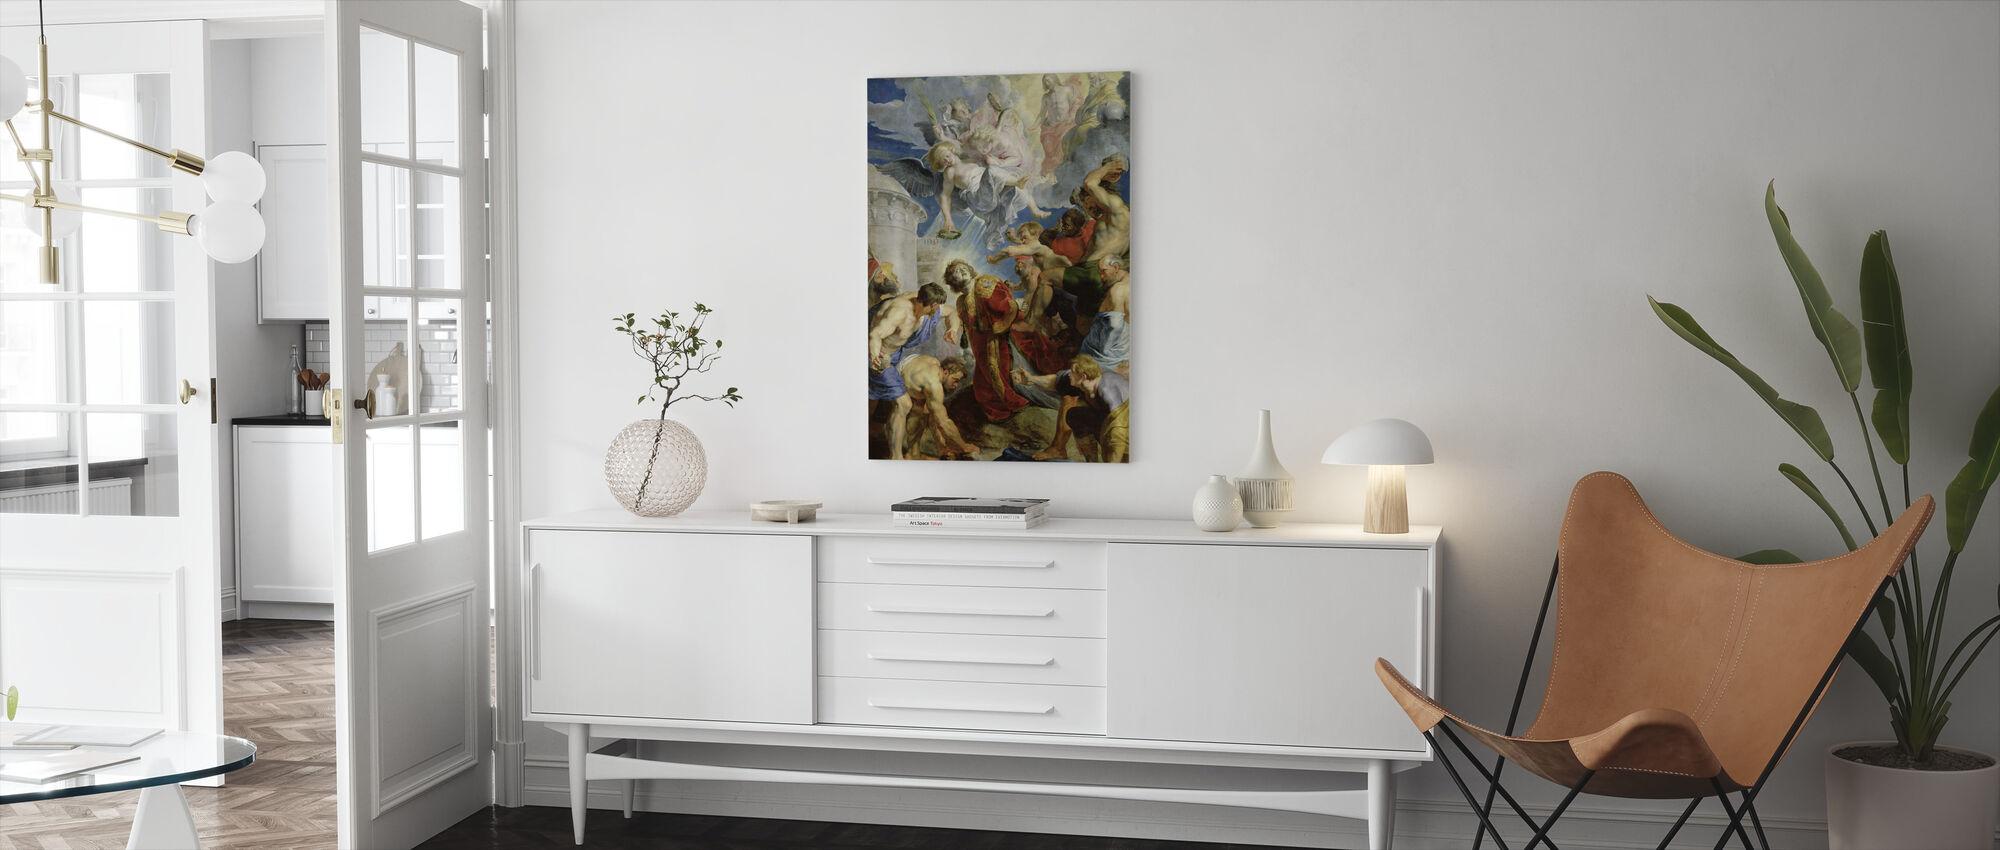 Stoning of St. Stephen - Peter Rubens - Canvas print - Living Room